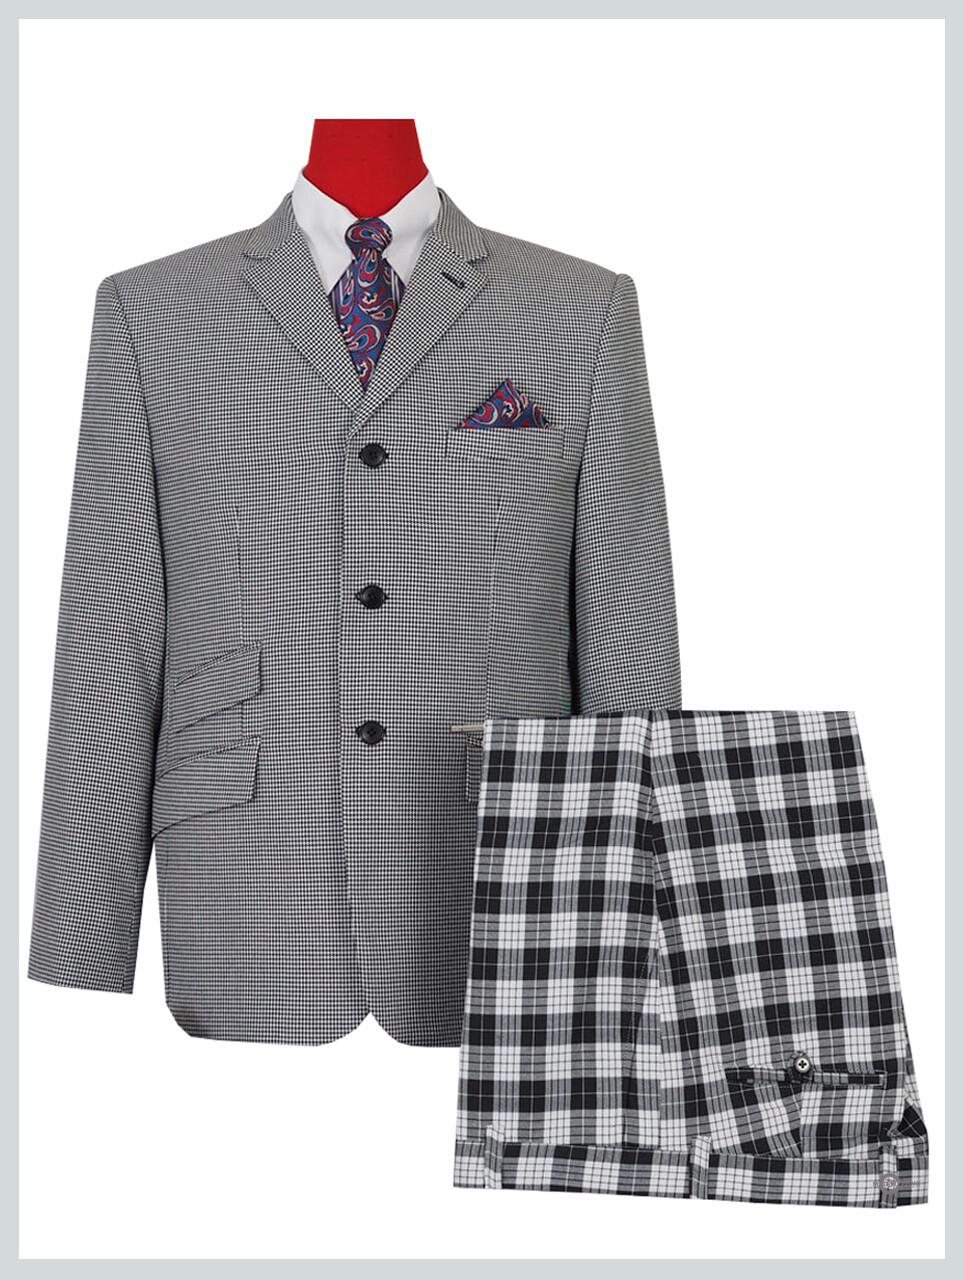 white & black small houndstooth classic mod blazer for men,60s vintage fashion